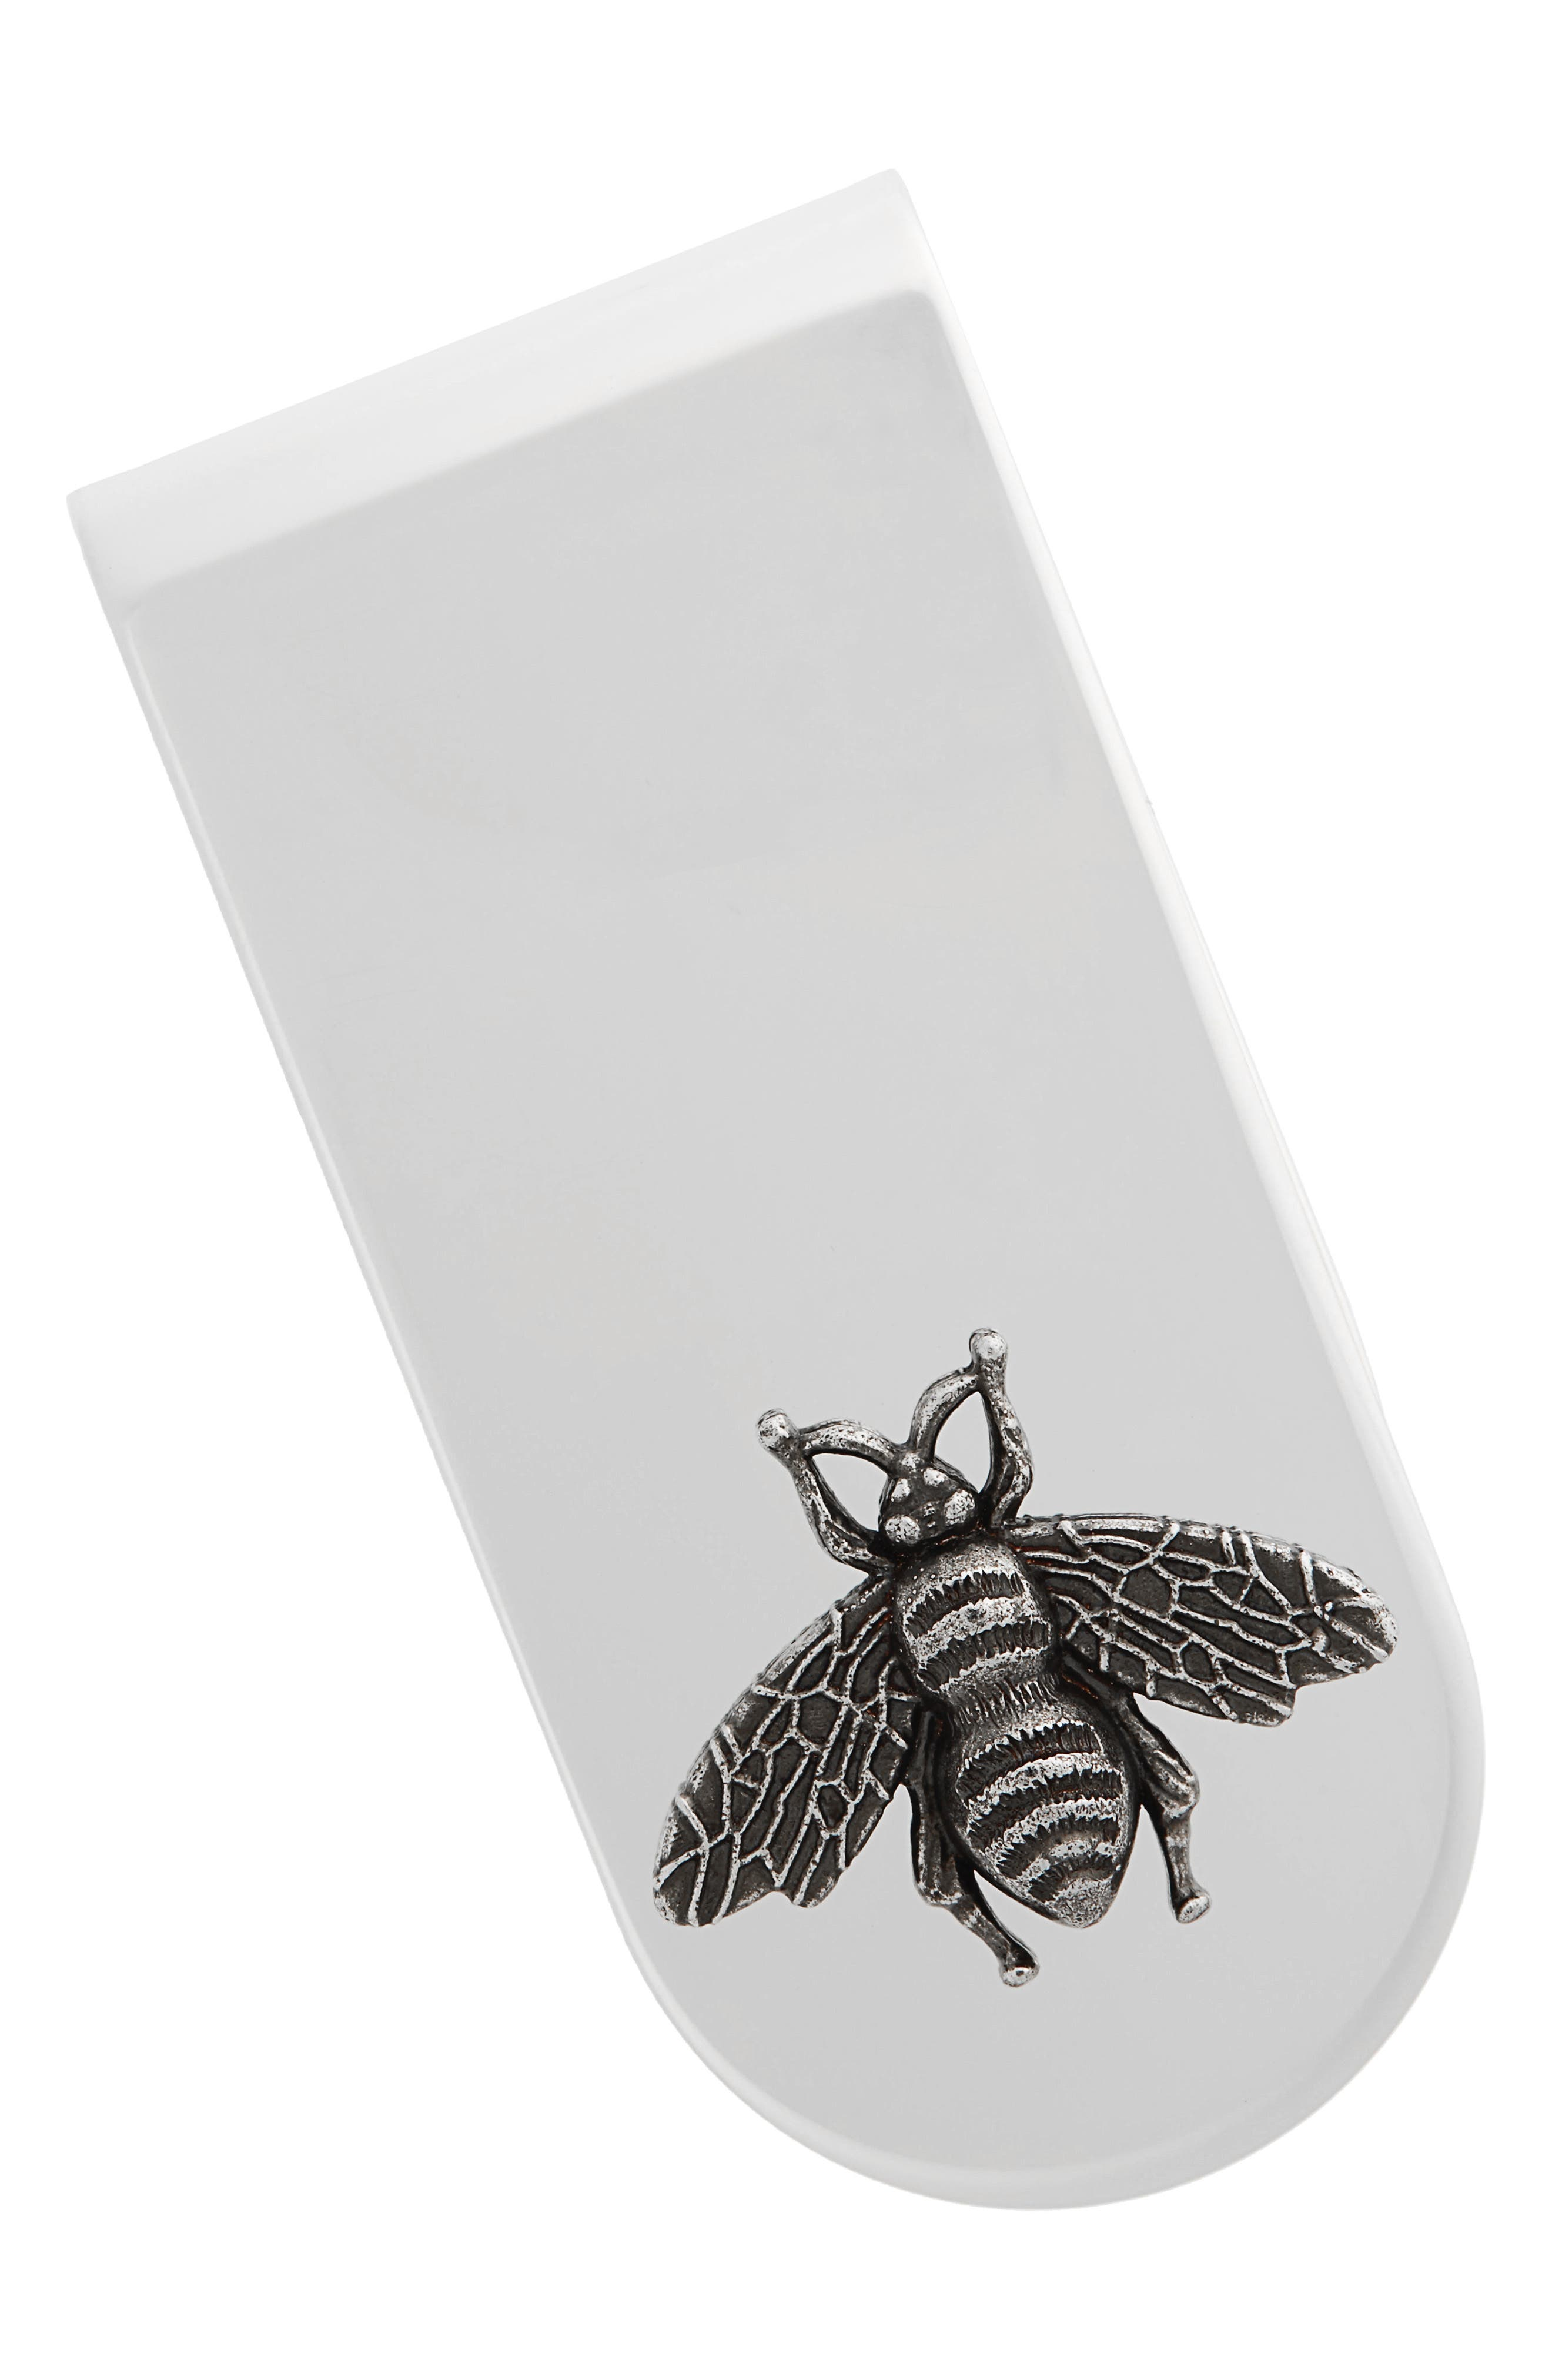 Bee Insignia Brass Money Clip,                             Main thumbnail 1, color,                             SILVER